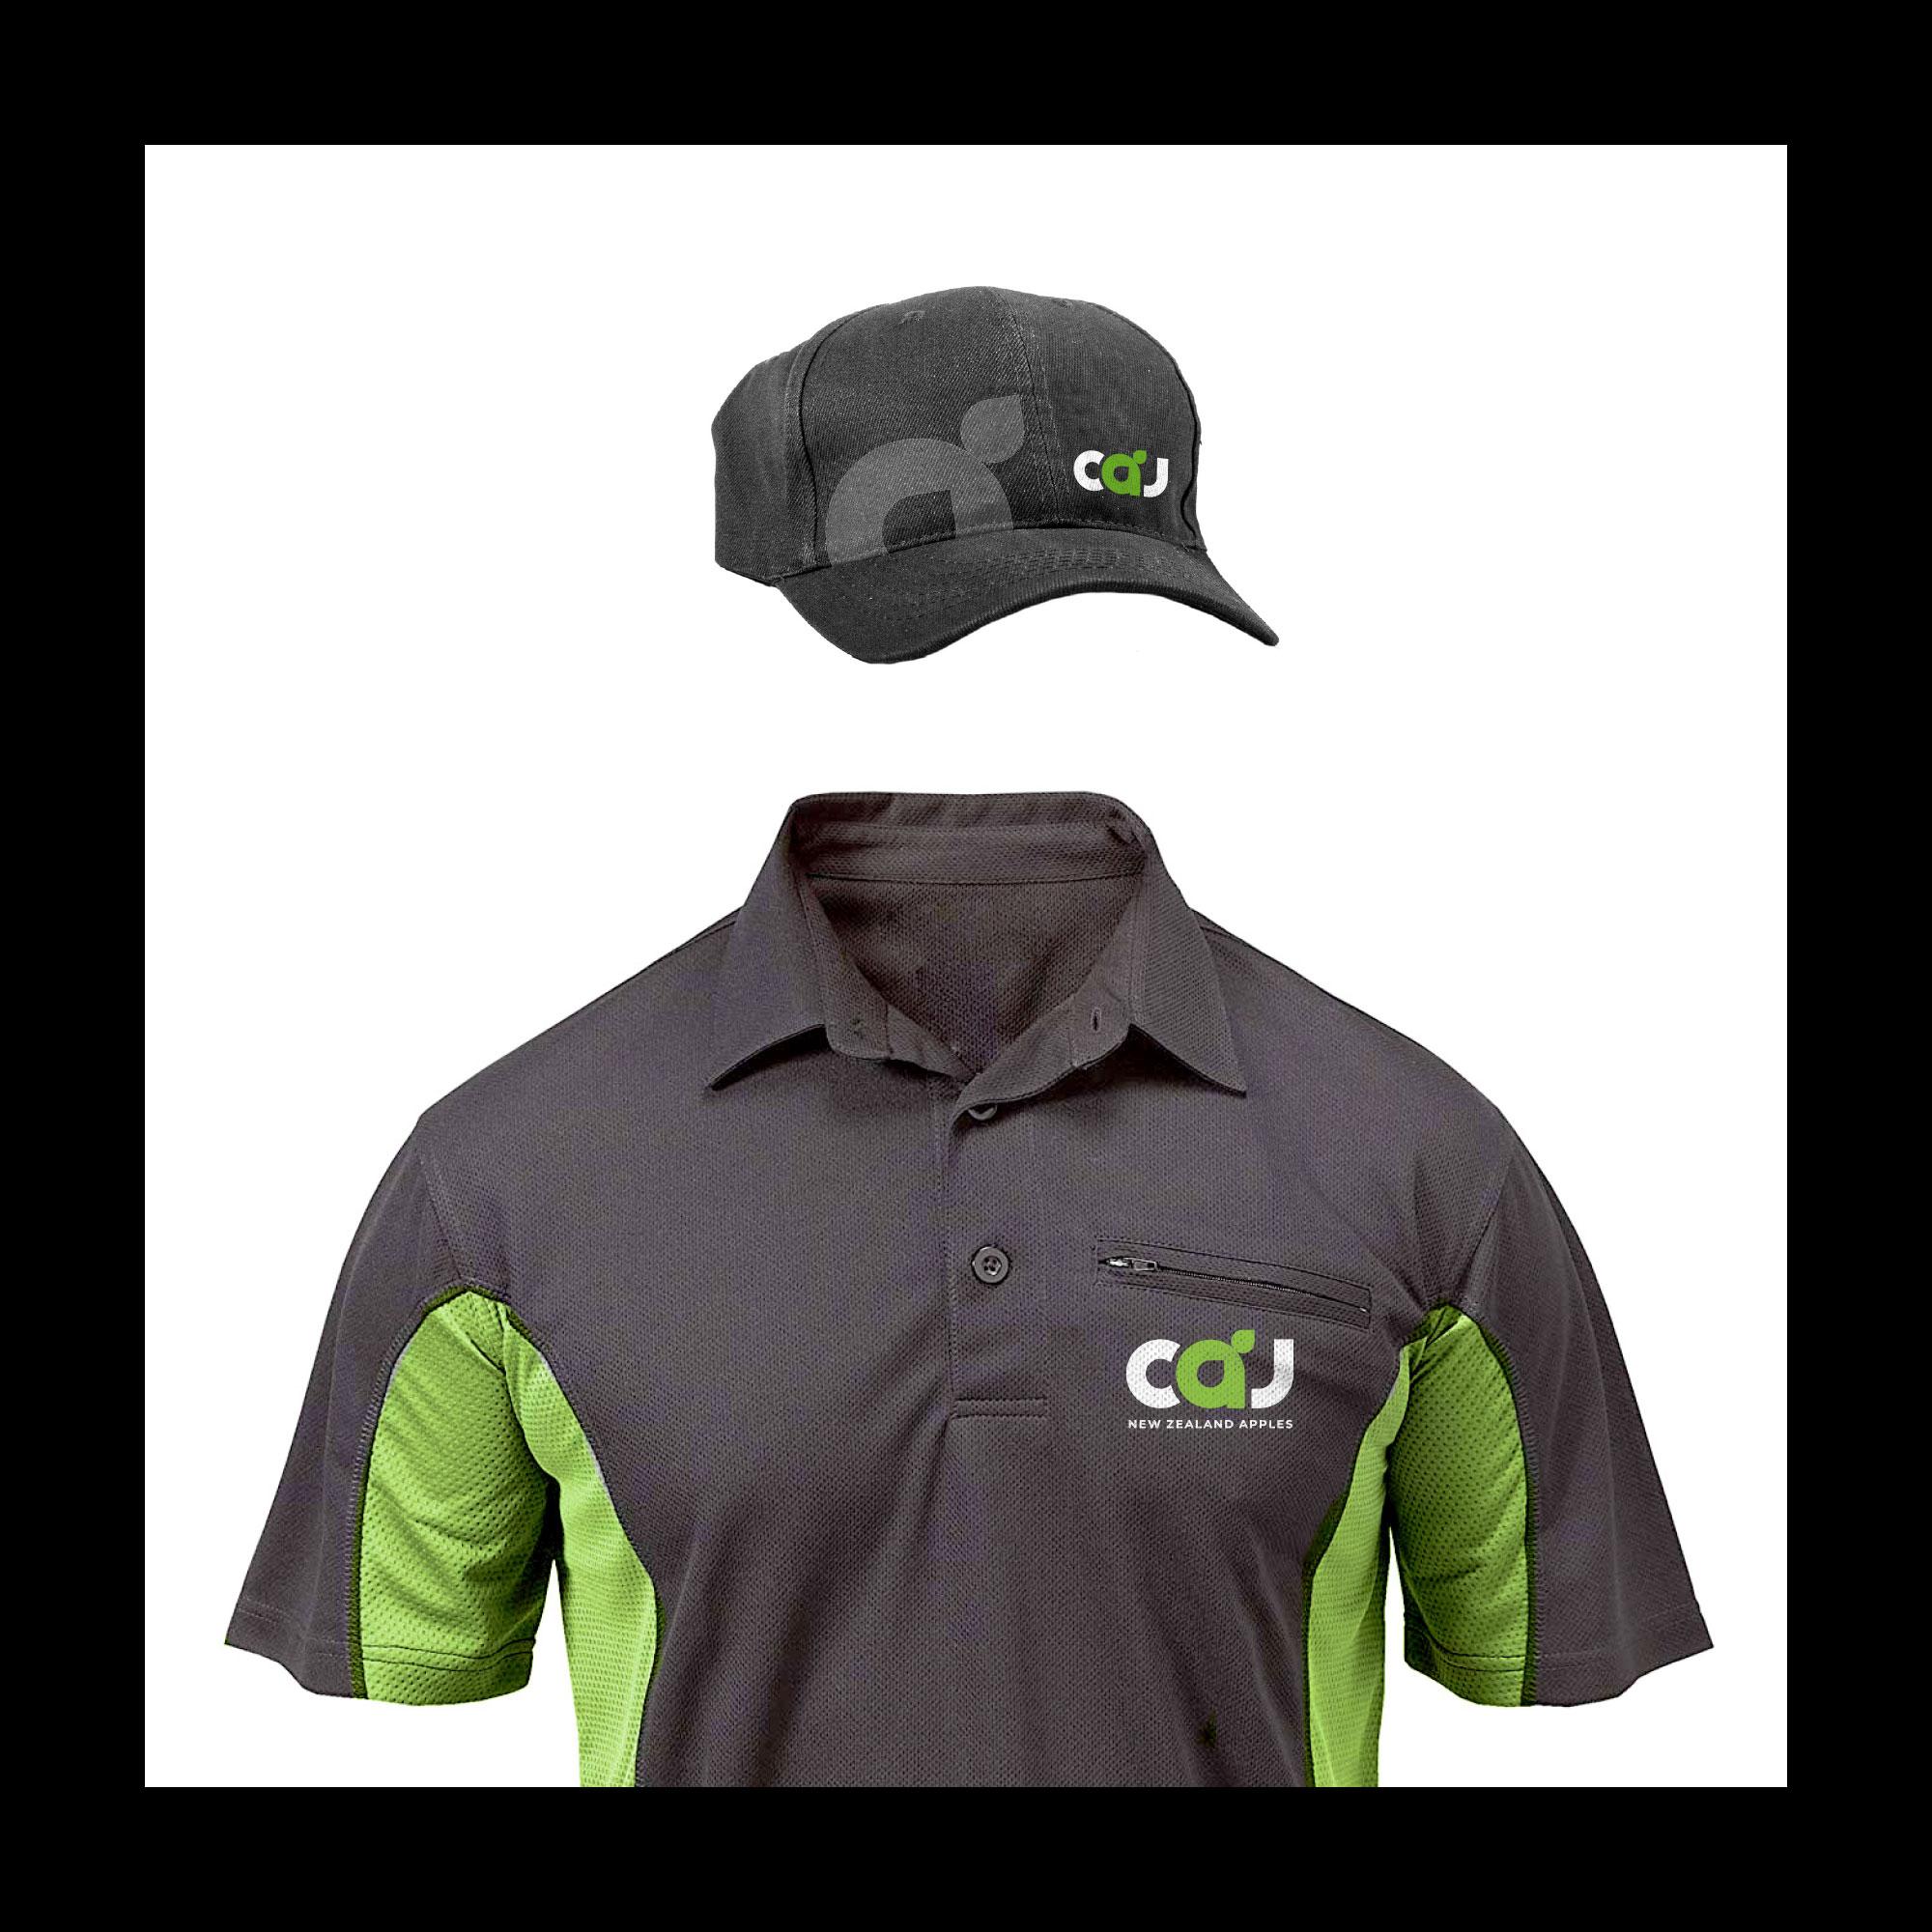 CAJ garment branding